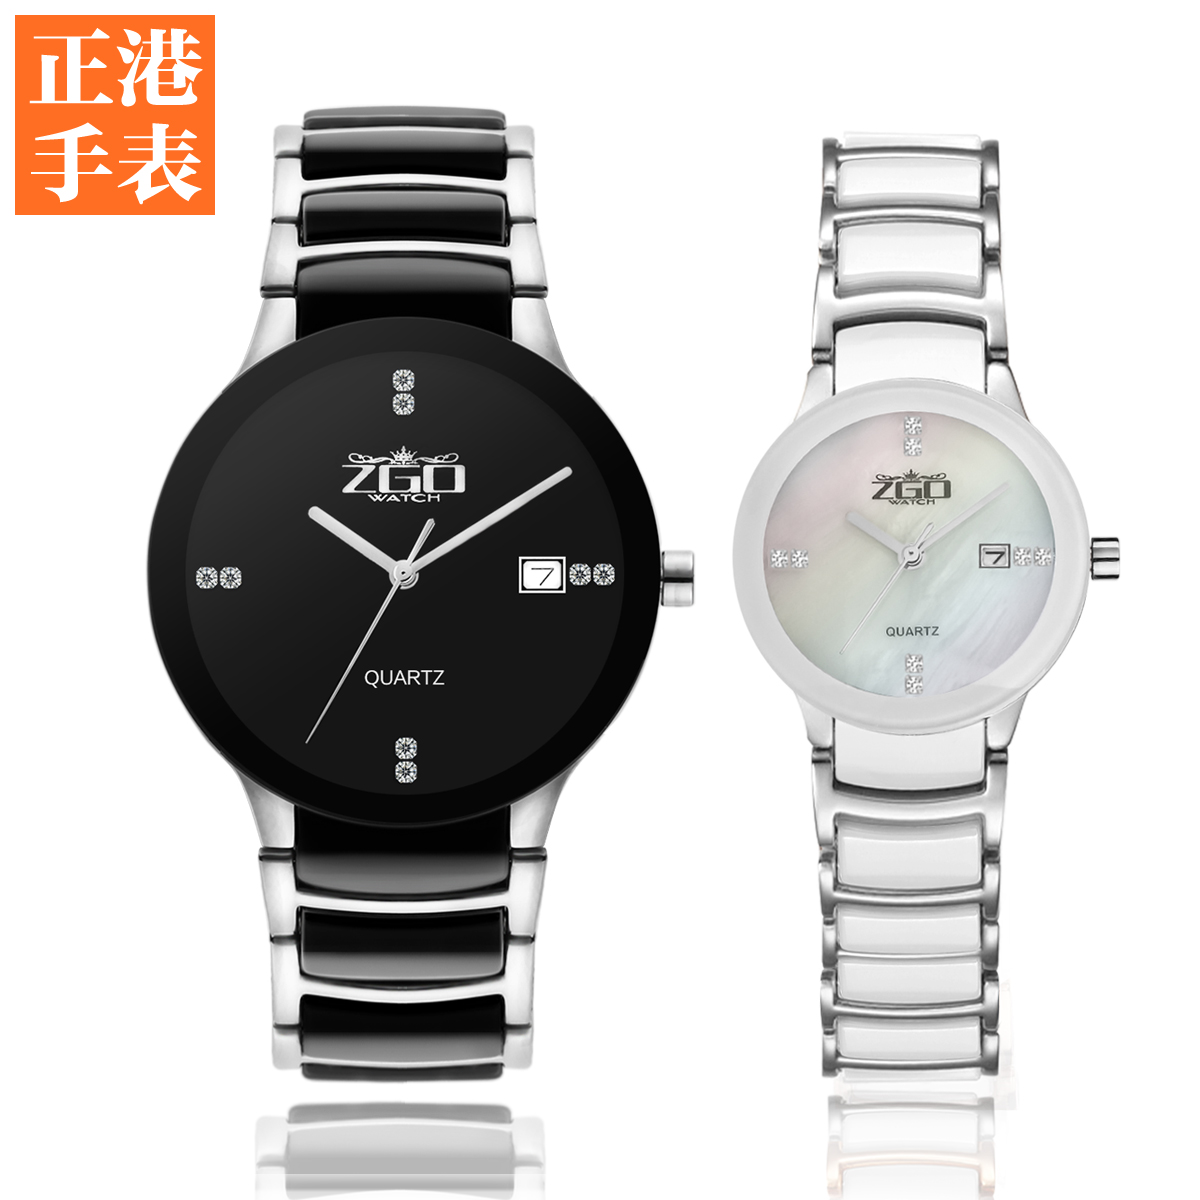 ZGO时尚超薄情侣手表一对 韩国正品水钻陶瓷表韩版潮流防水石英表